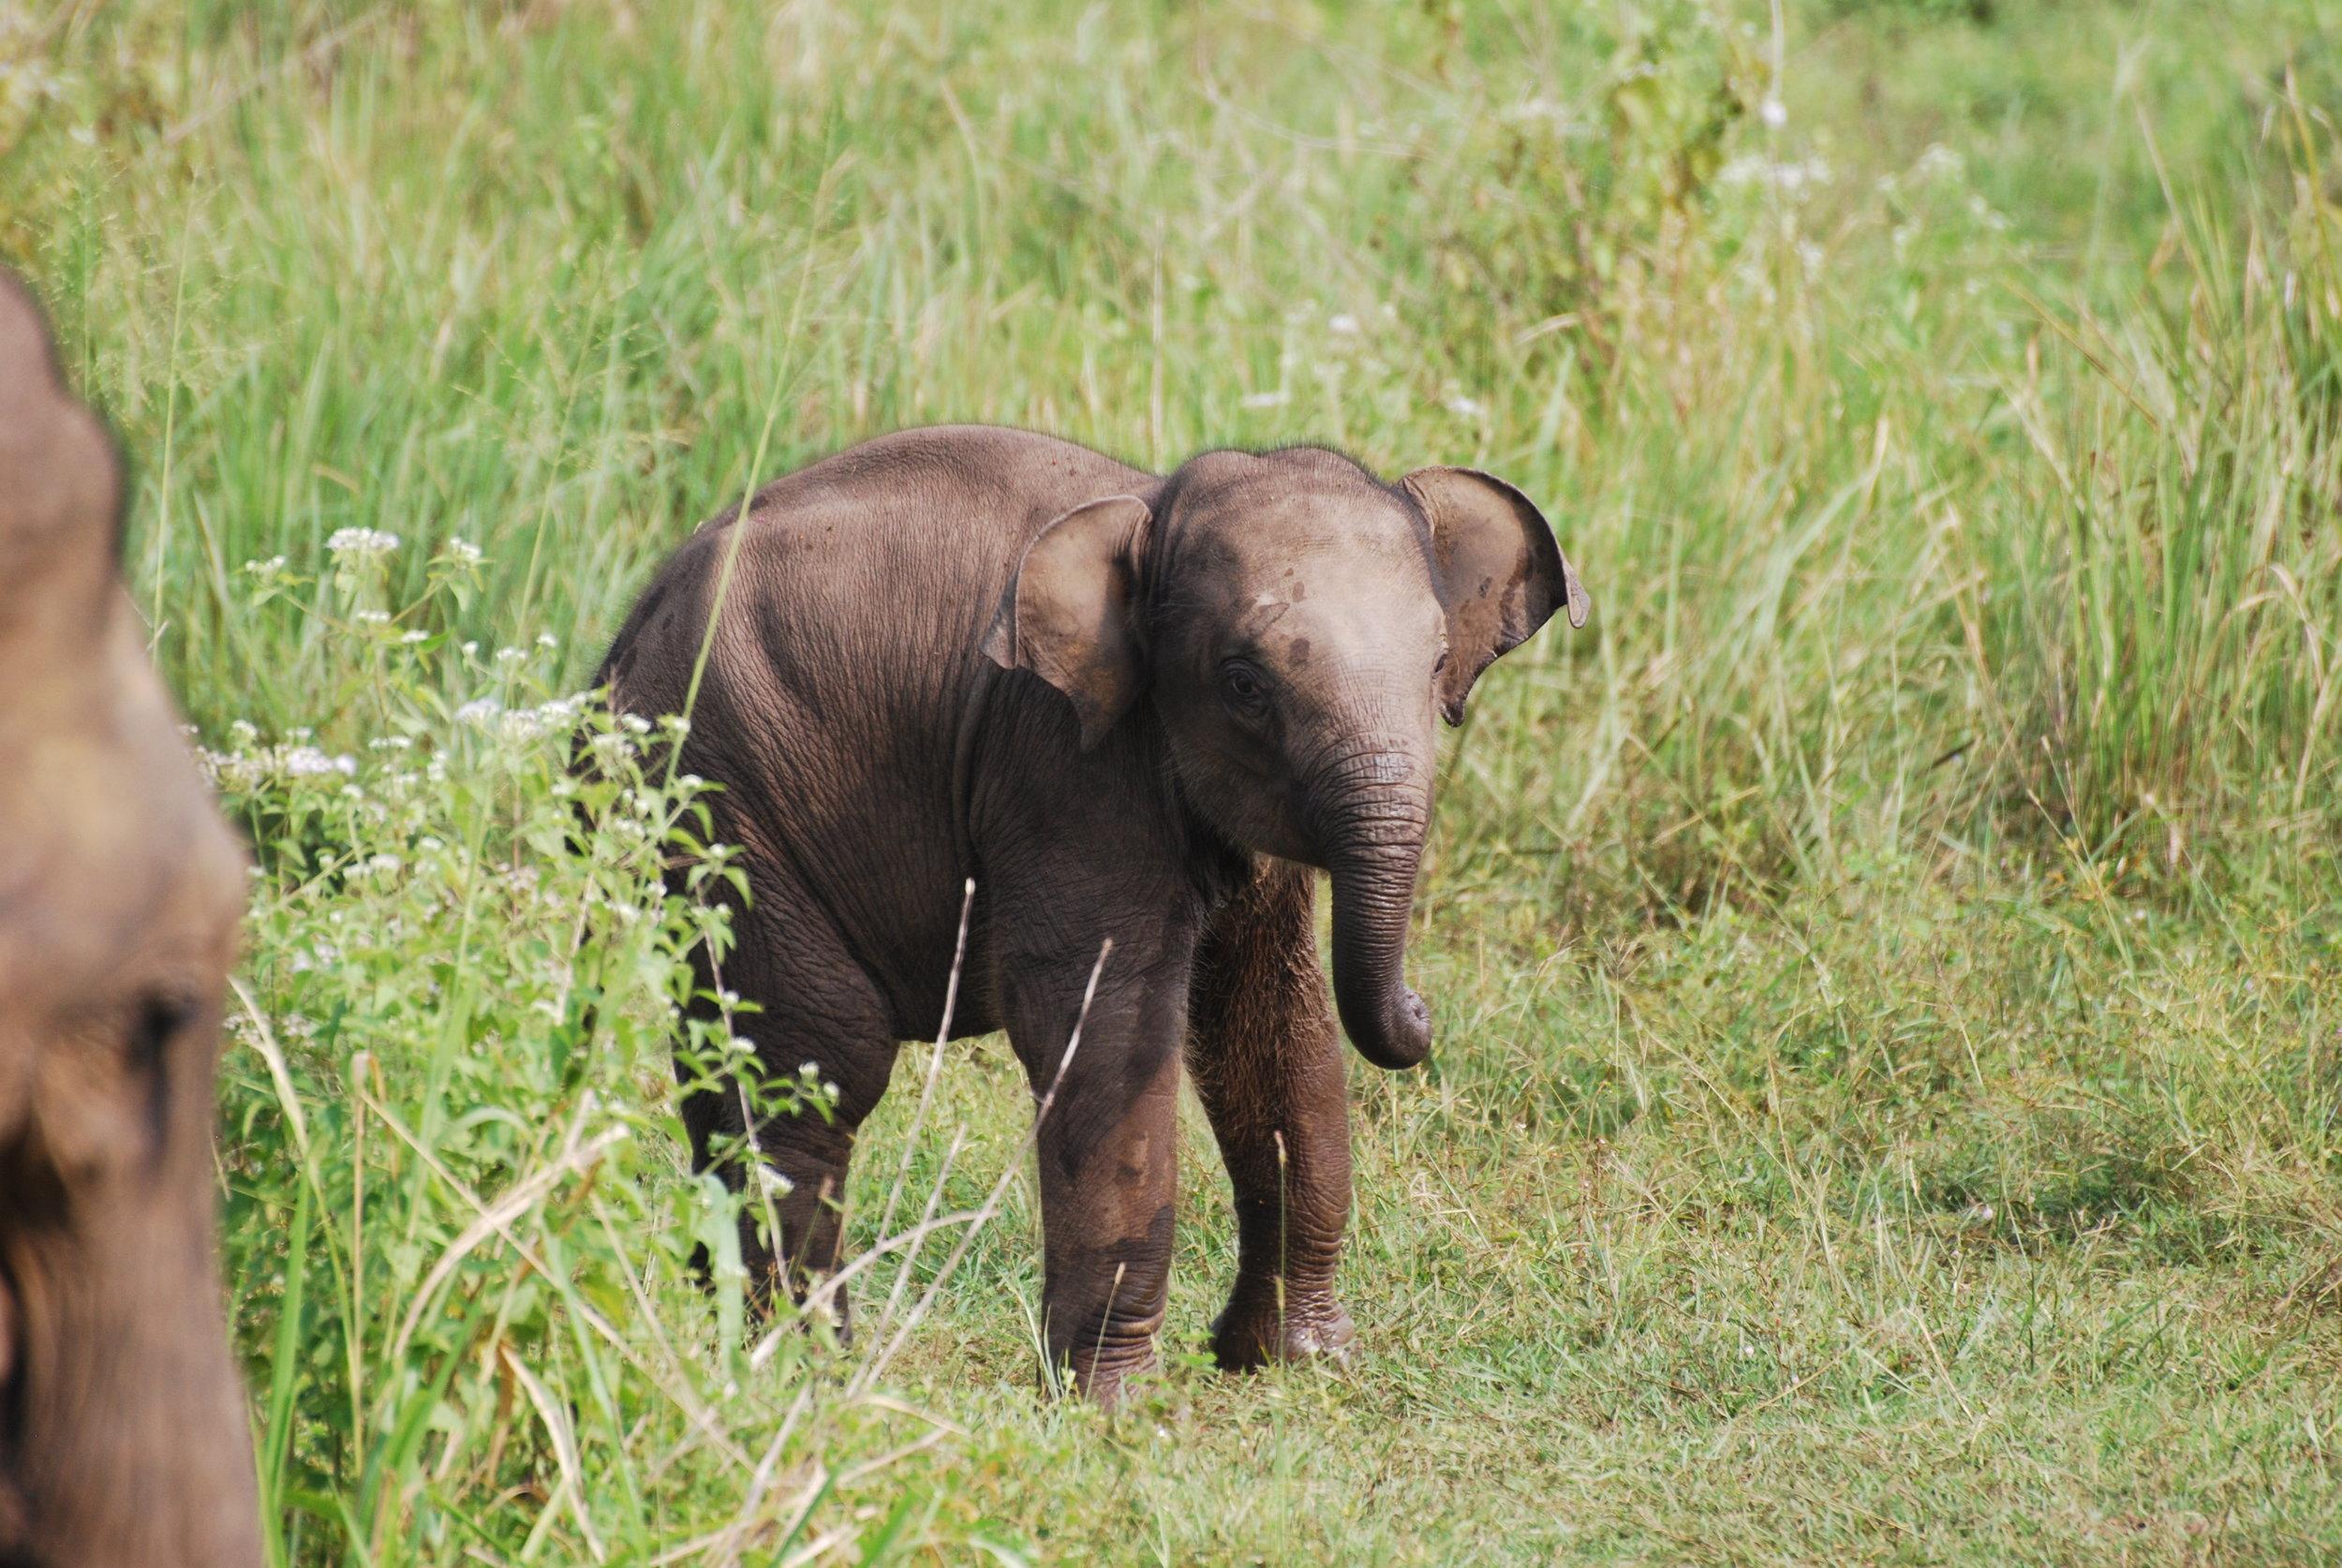 Baby photo #2: Elephant calf, Wasgamuwa National Park, 28 December 2018. Photo: Chase LaDue.